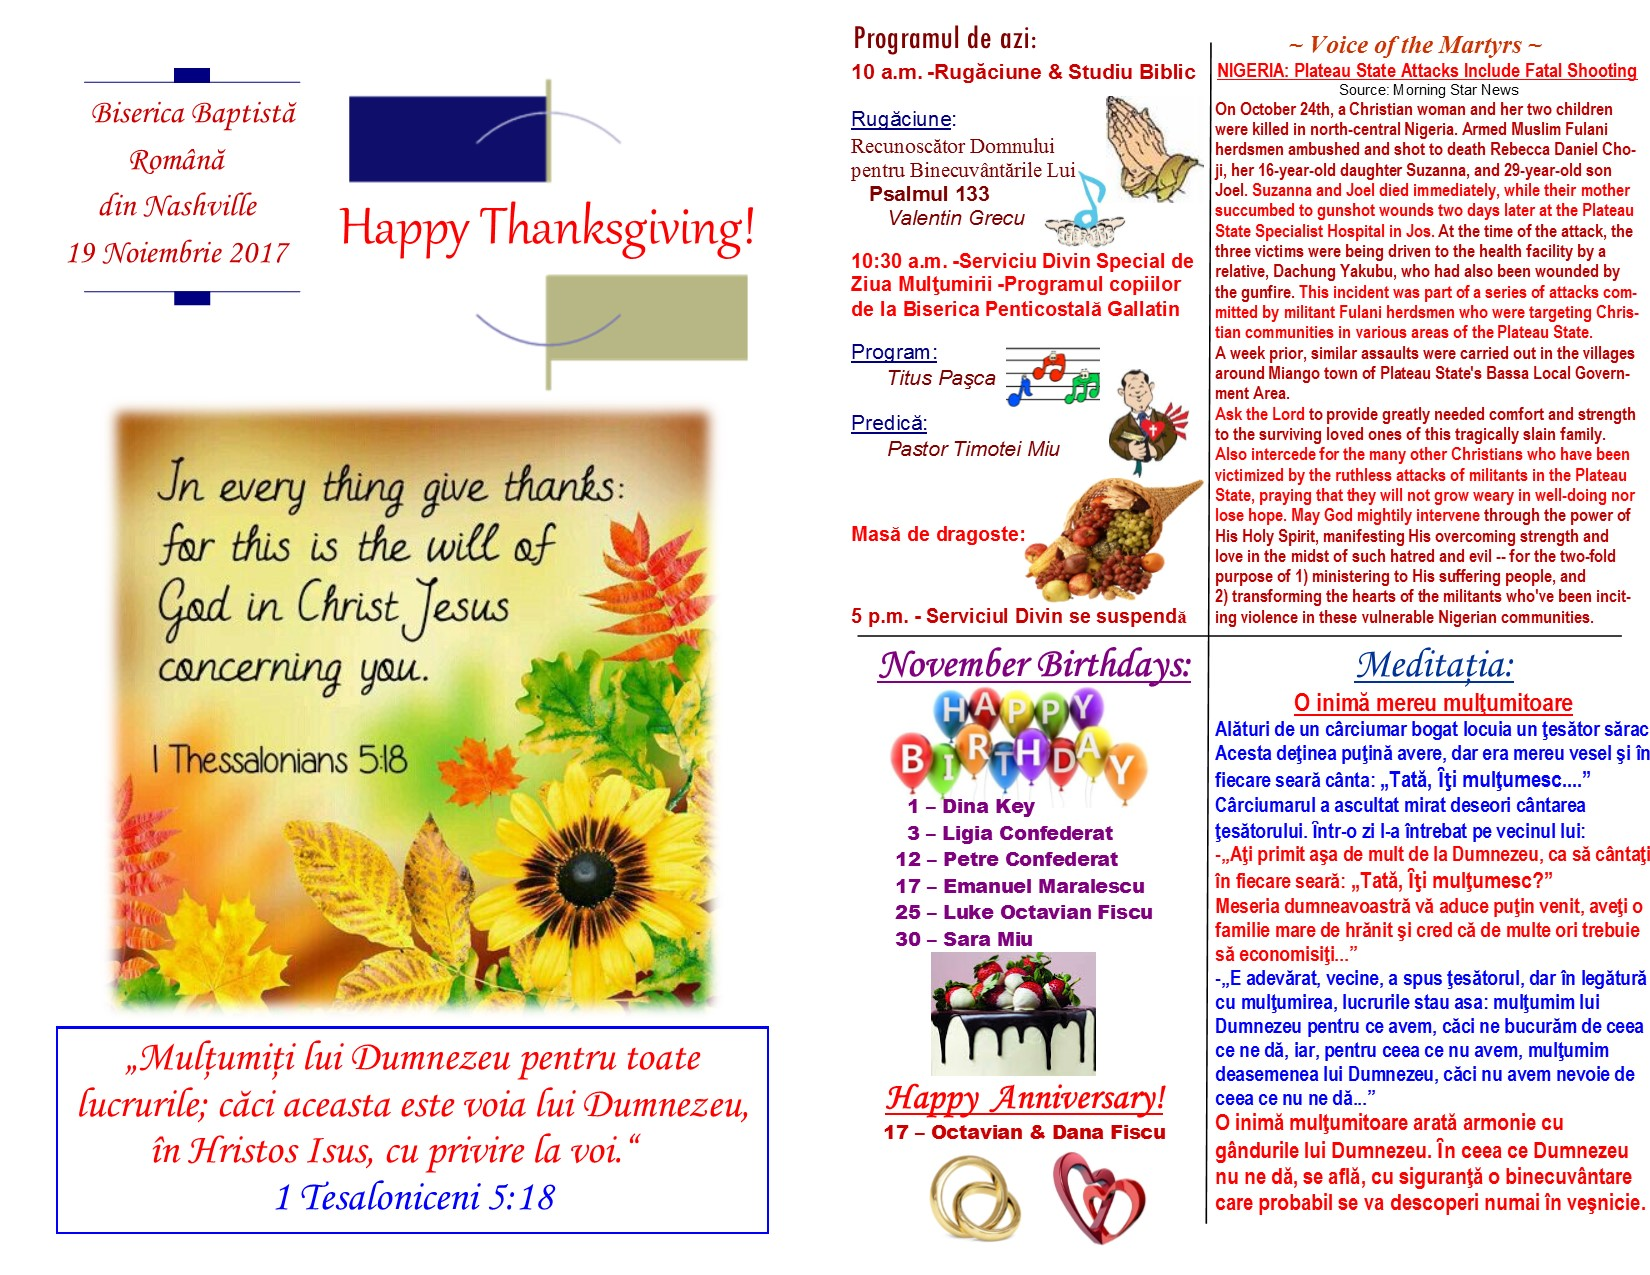 Buletin 11-19-17 page 1 & 2